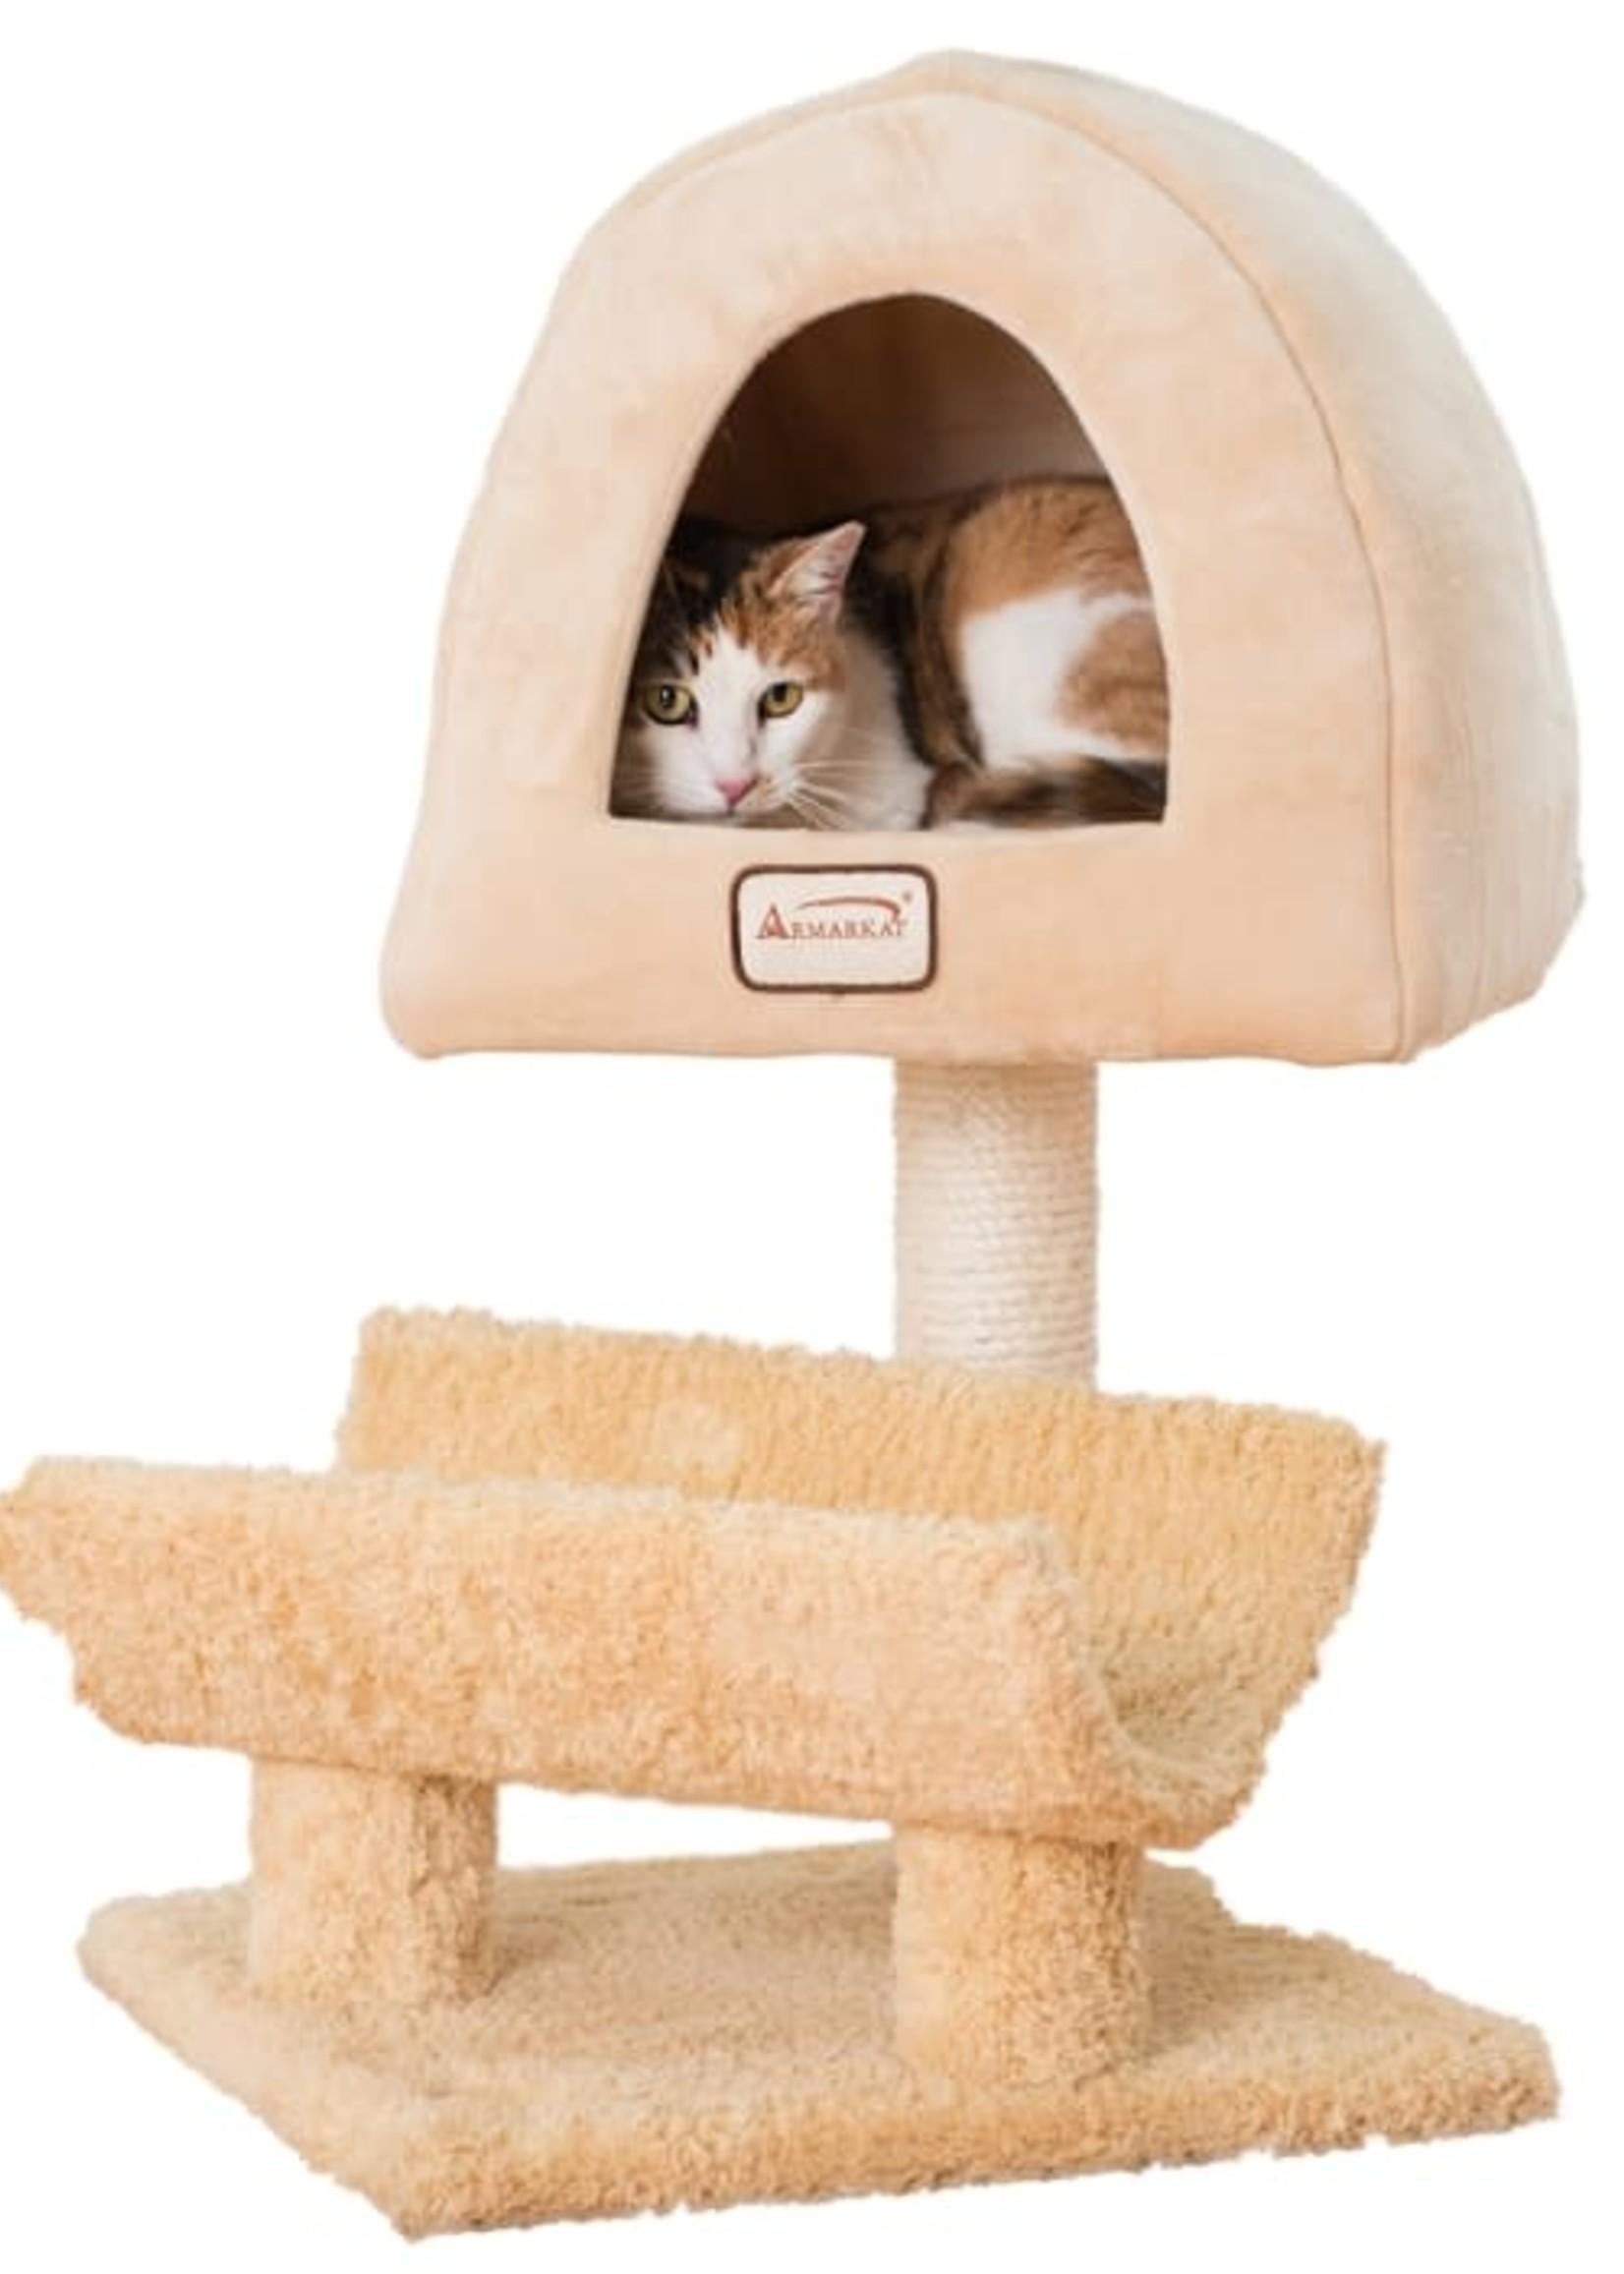 Armarkat Armarkat 31-in Cat Scratching Post & Condo Cat Tree, Goldenrod